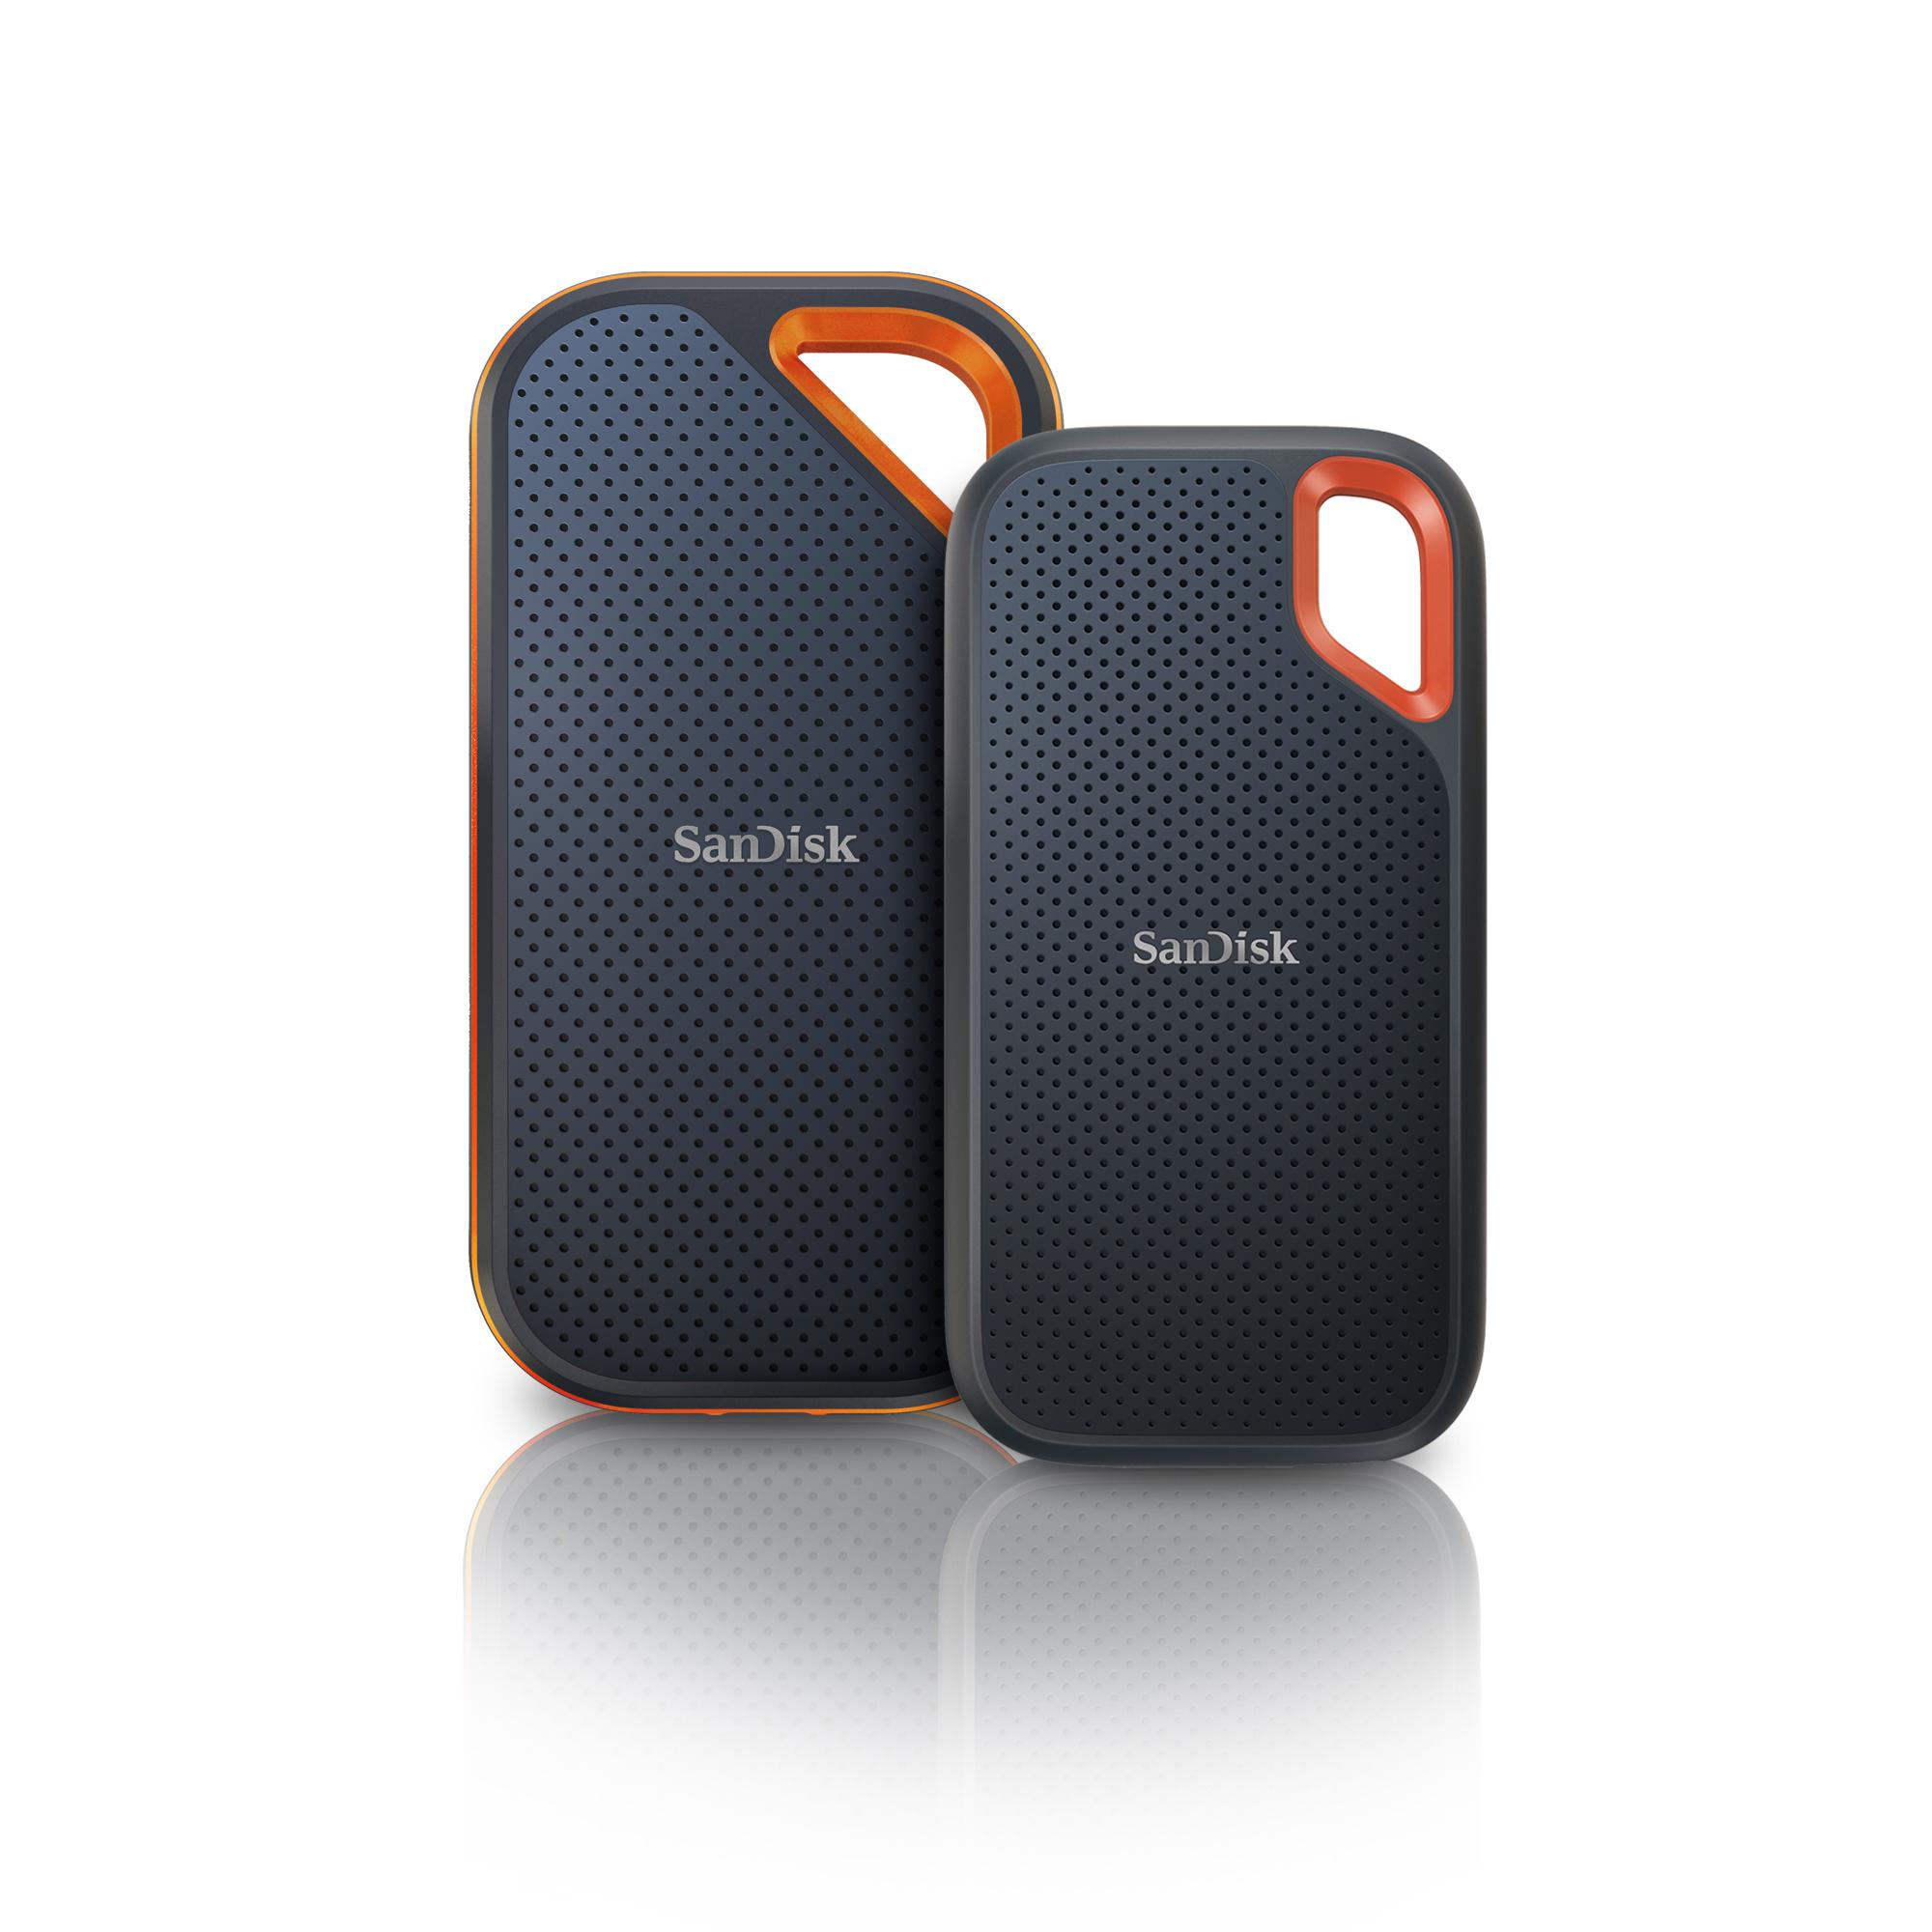 SanDisk Extreme Pro Portable und SanDisk Extreme Portable